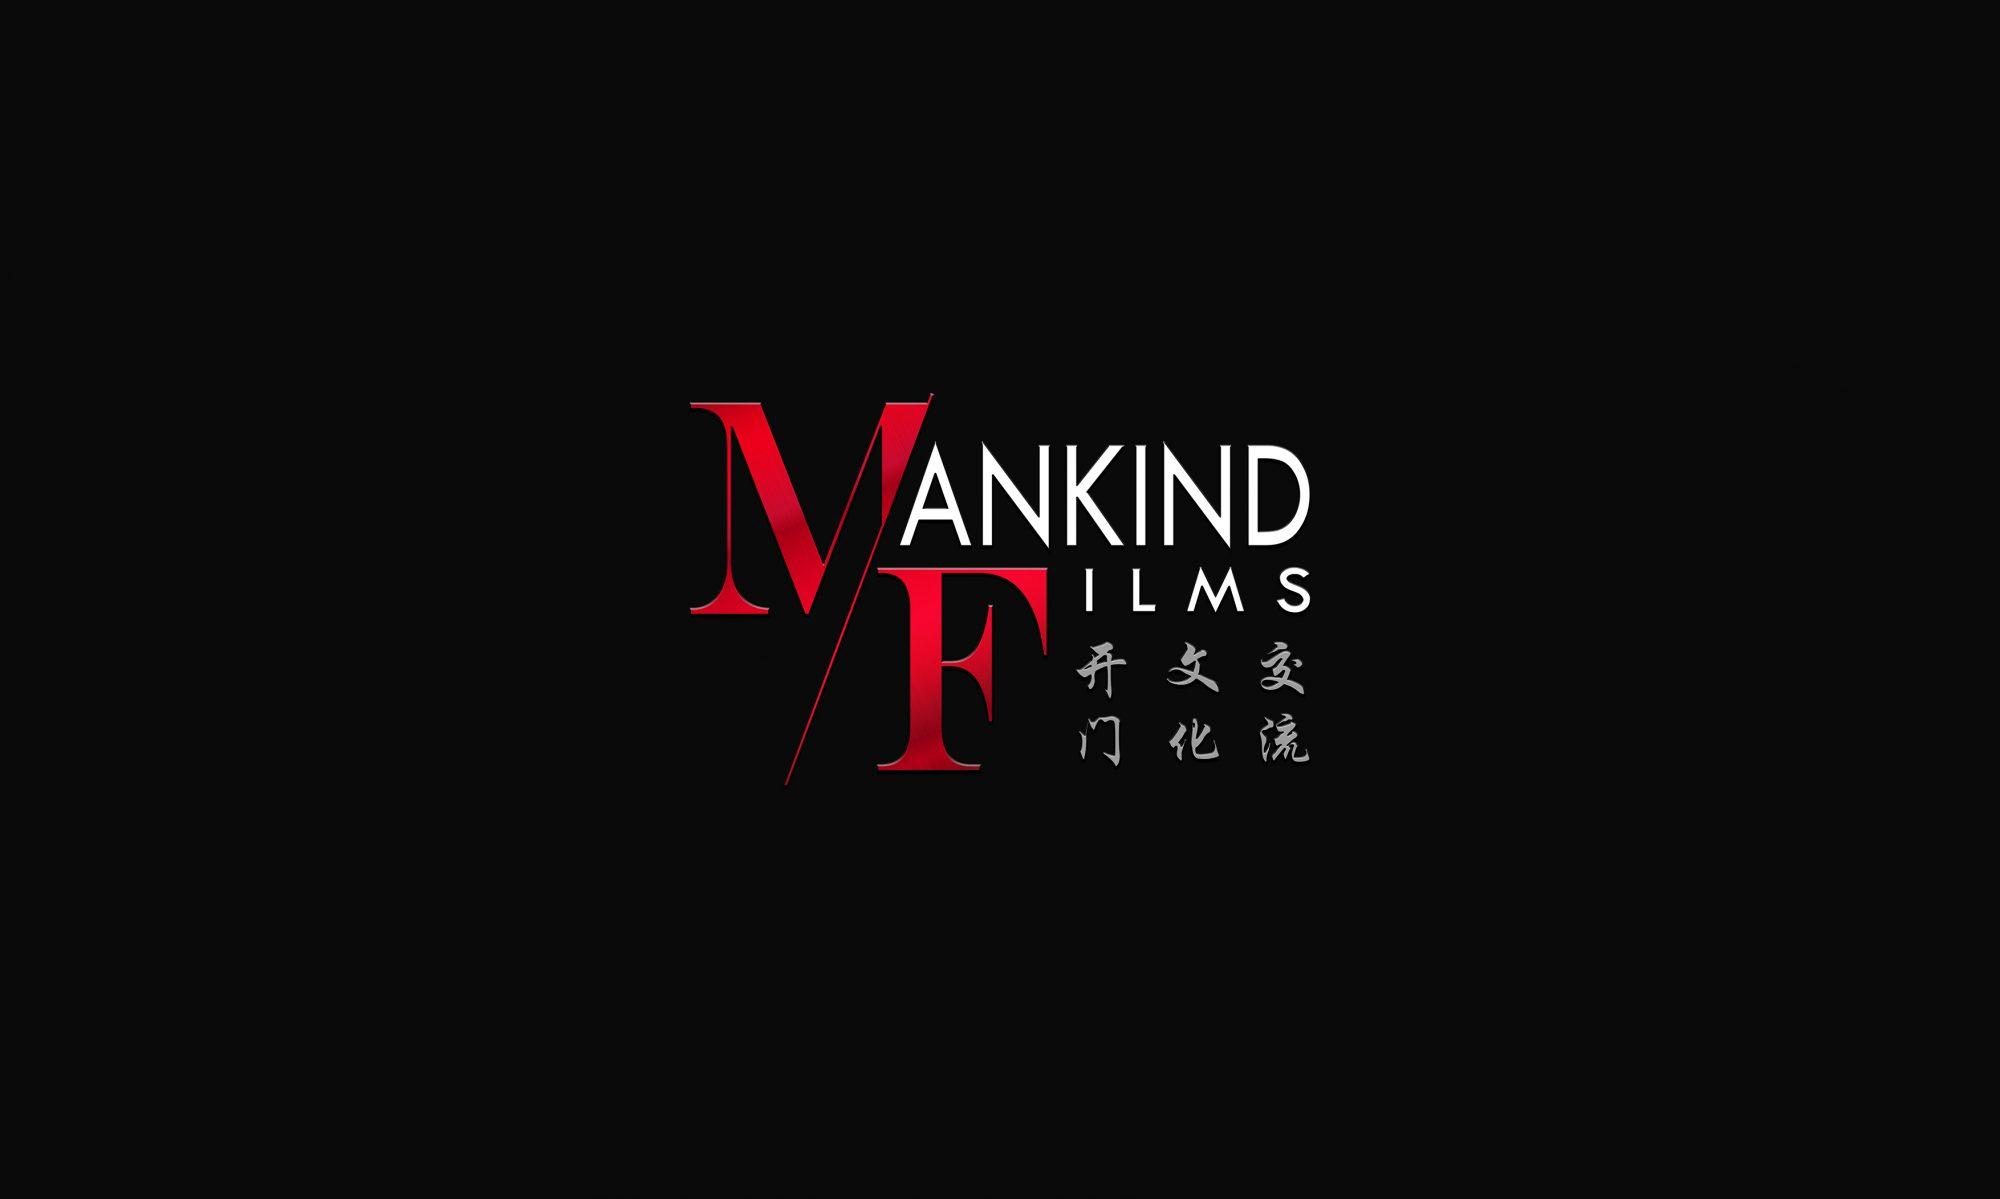 MANKIND FILMS